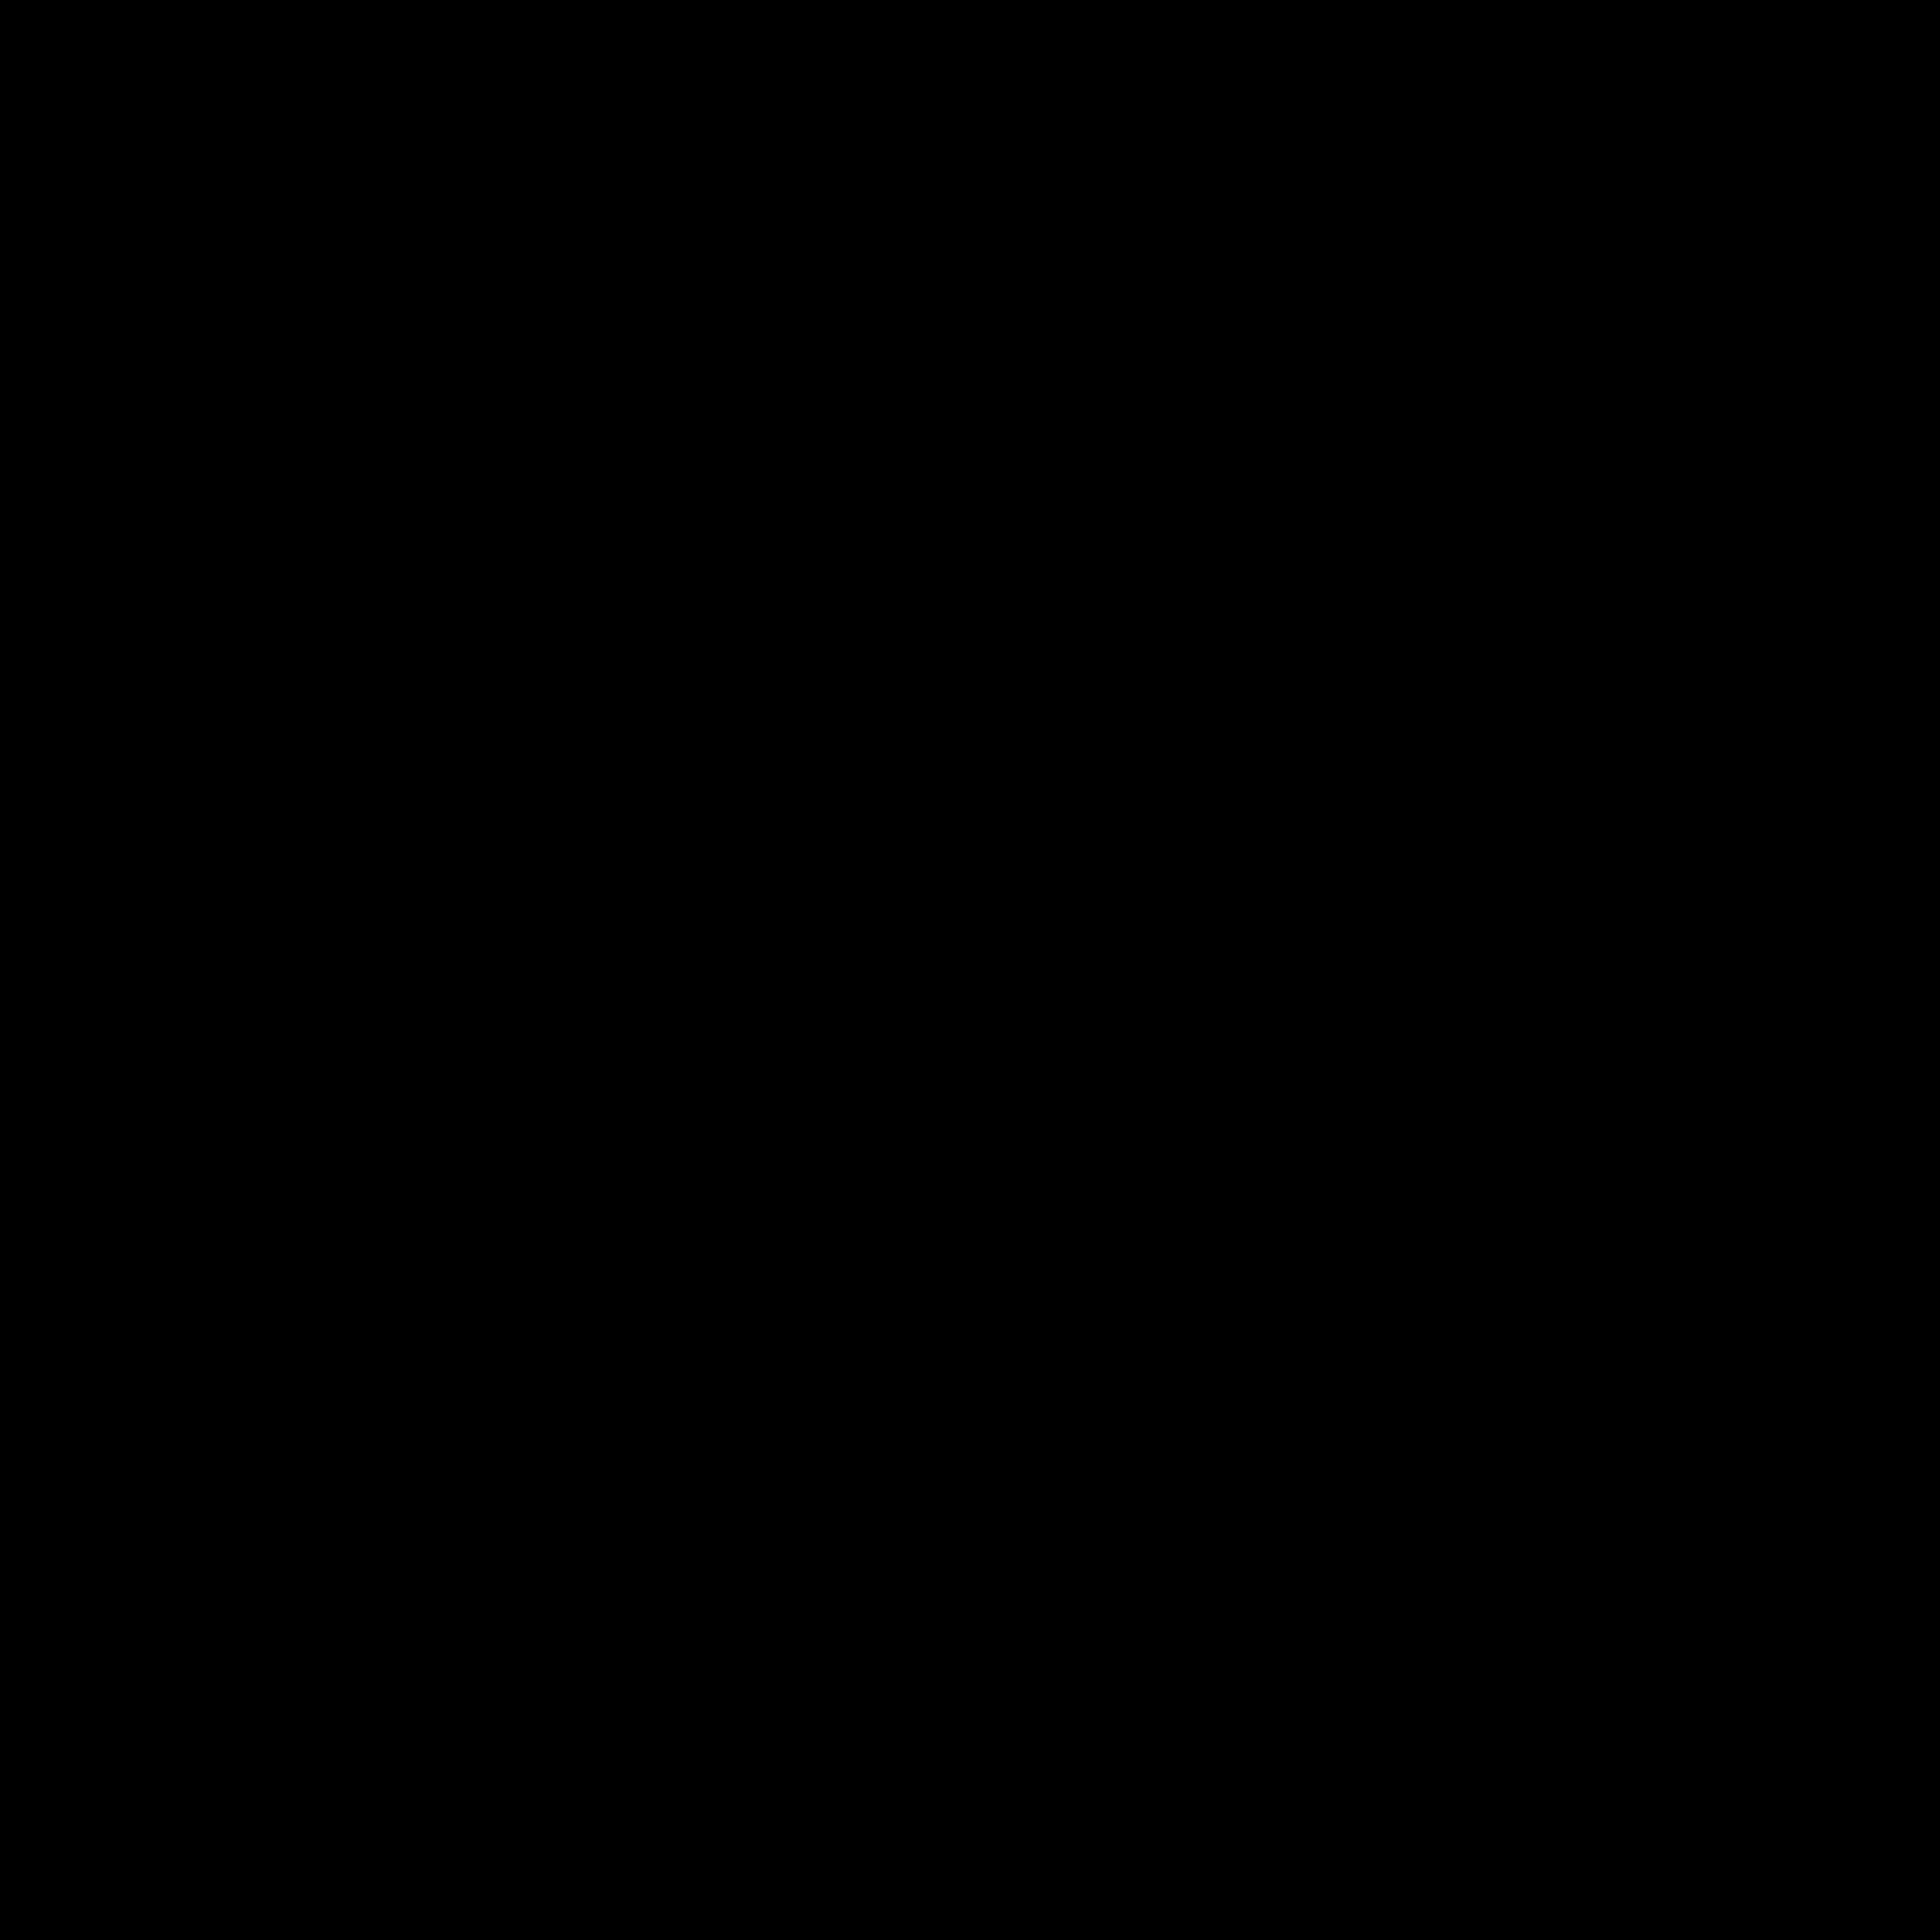 hurley logo 0 - Hurley Logo